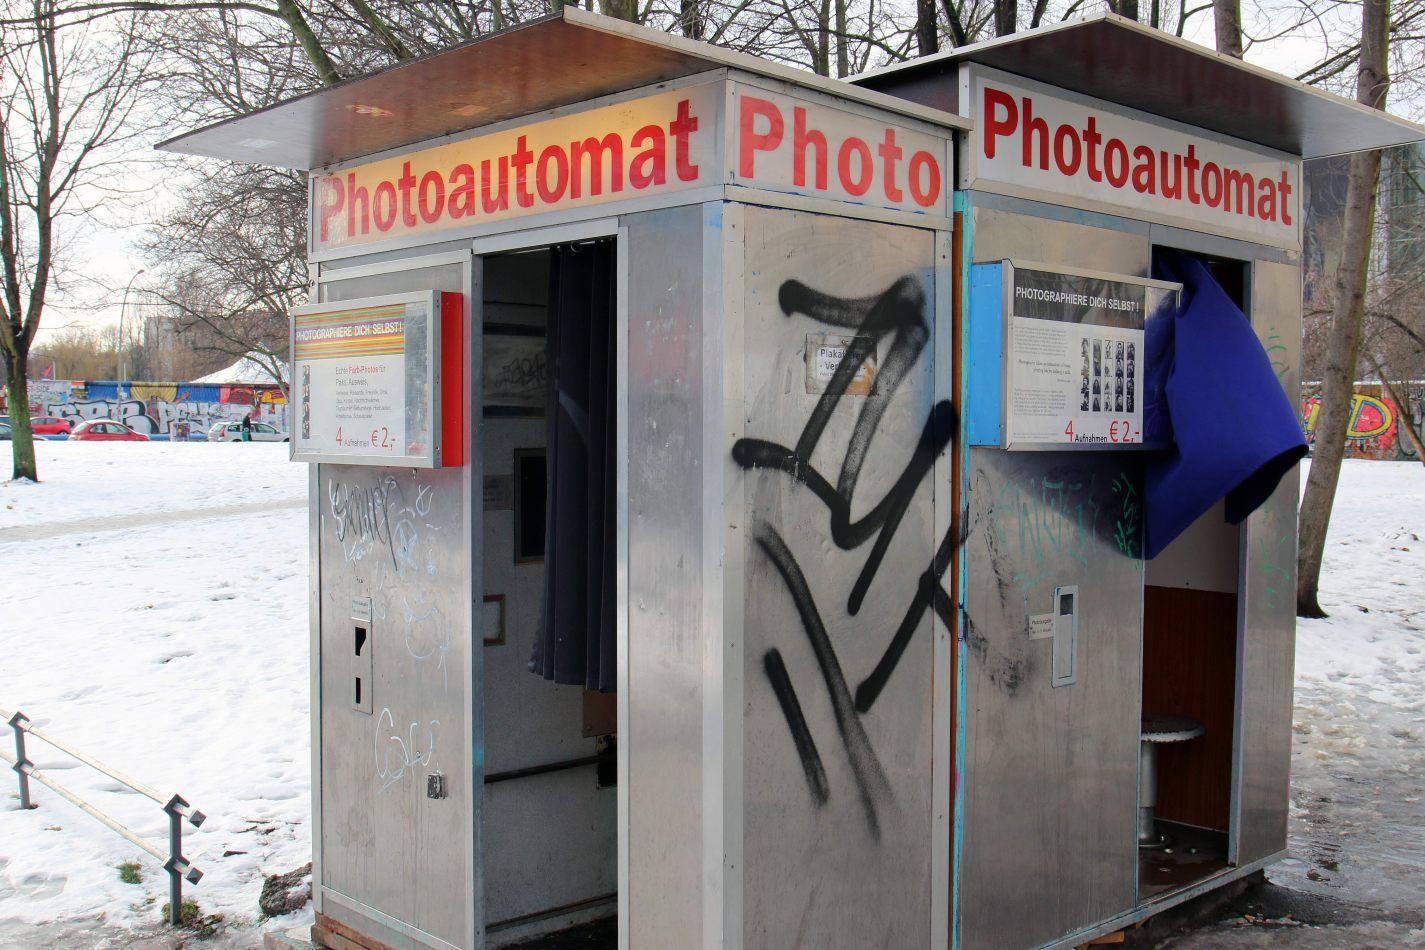 Anthony Ellis Photography: Das Ist - Photoautomat